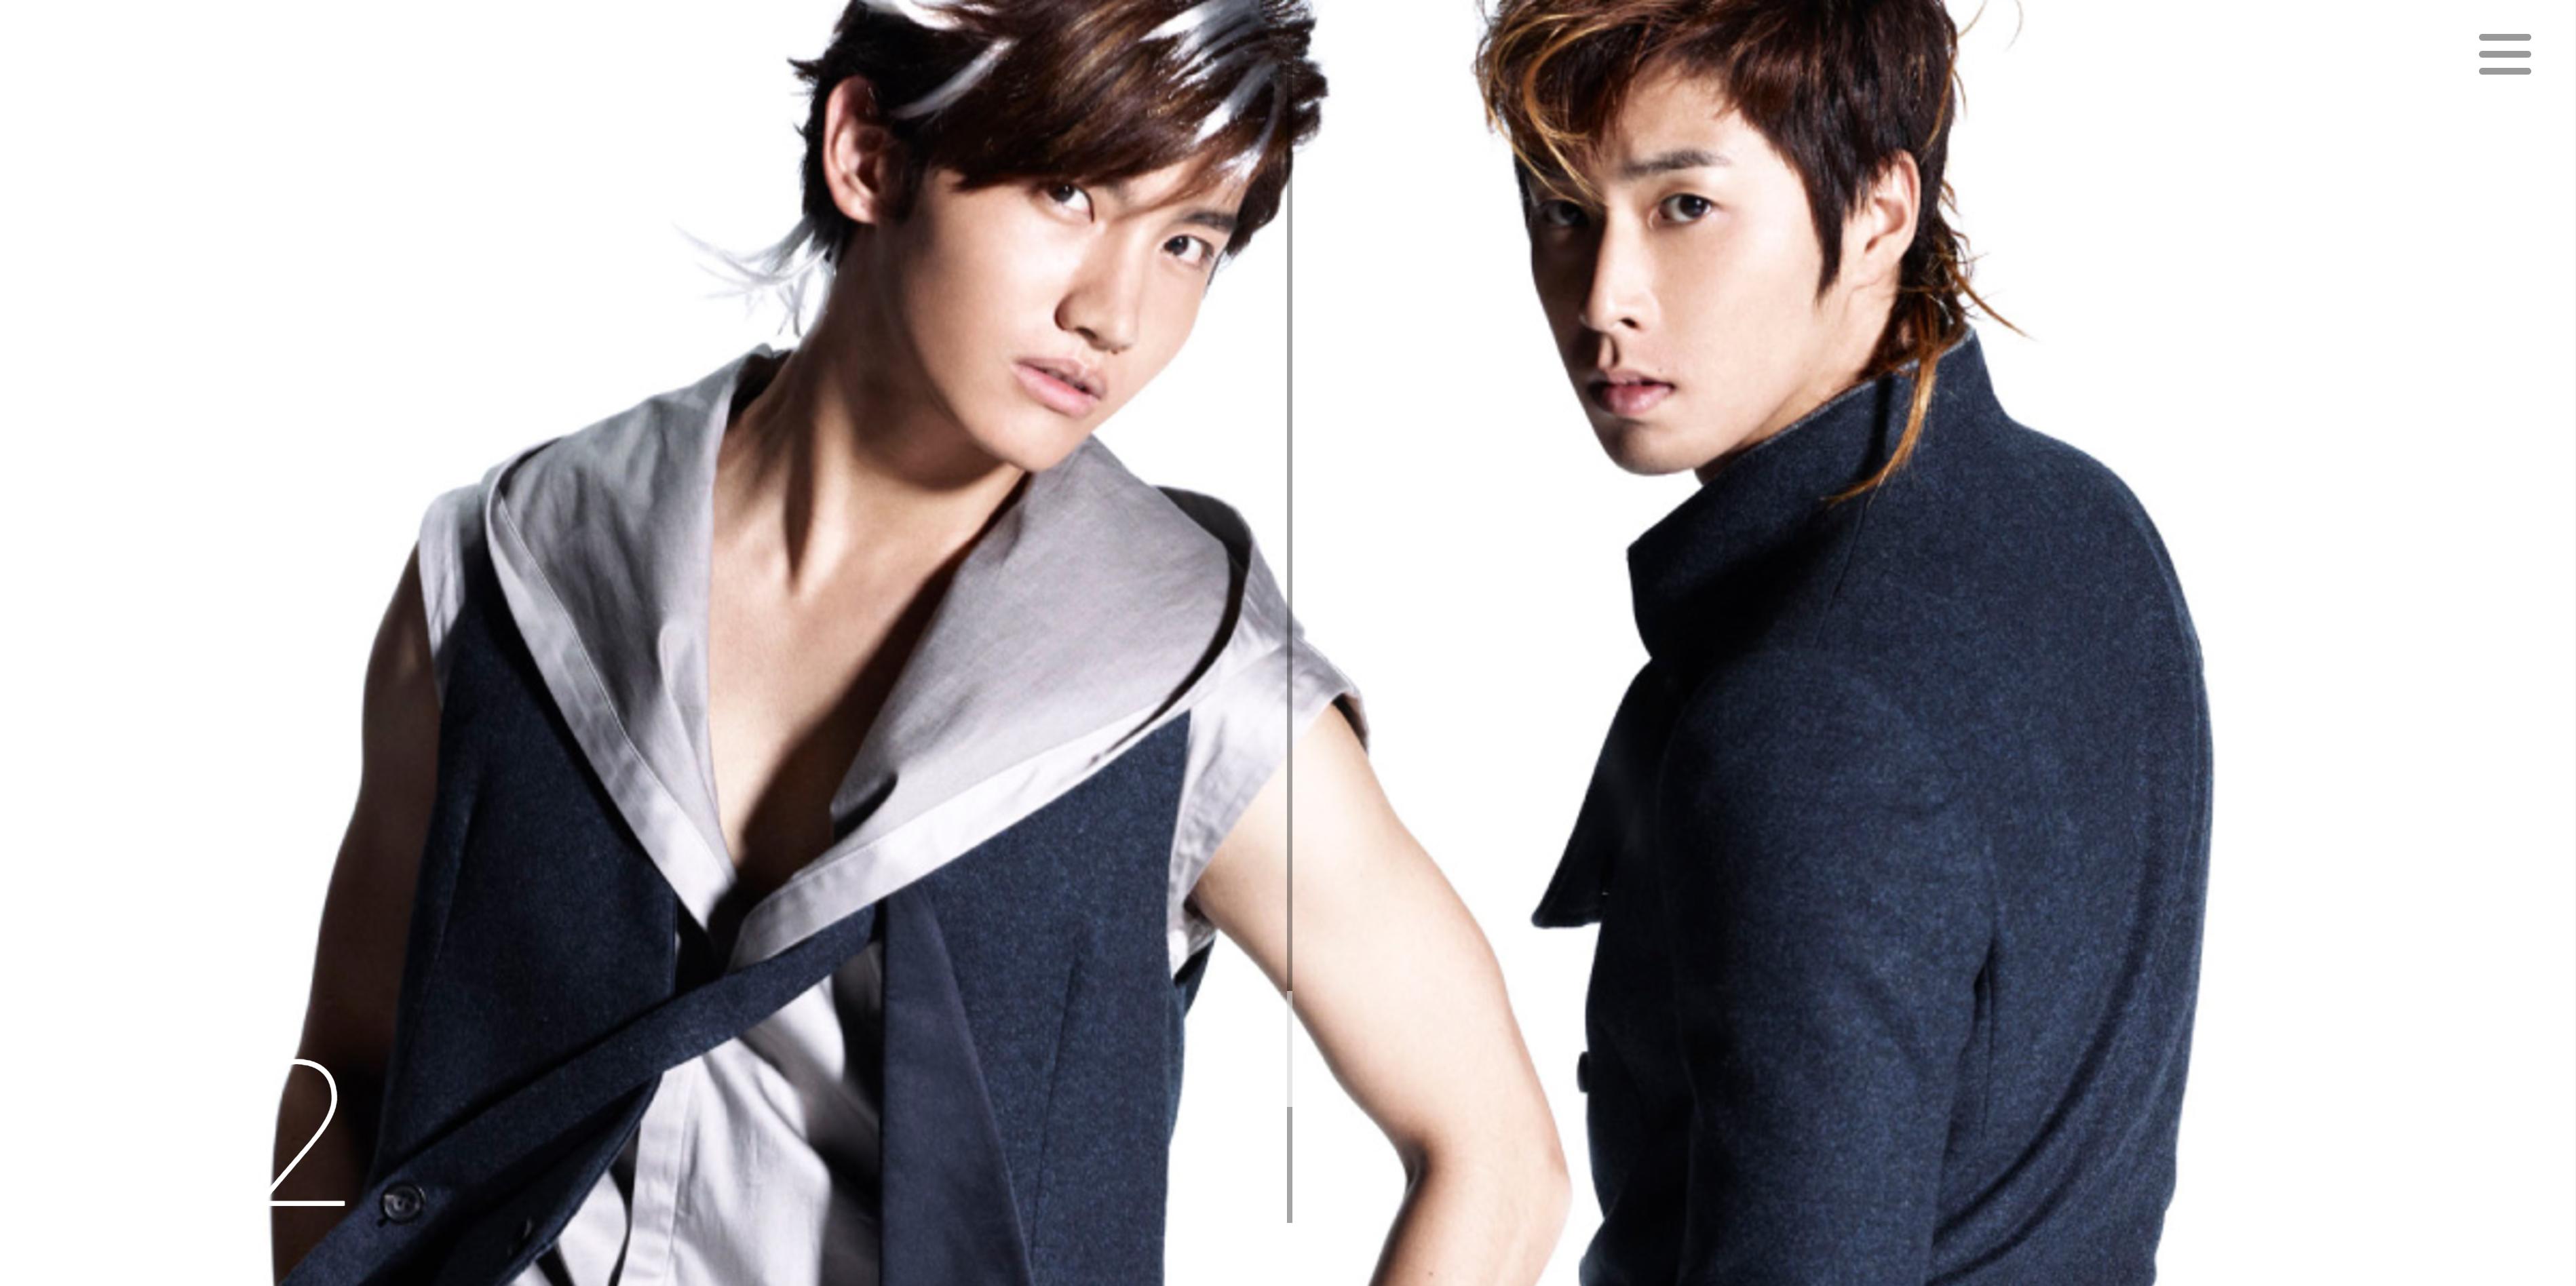 [PHOTO] 170816 Tohoshinki Official Website: D-2!!! (feat ...